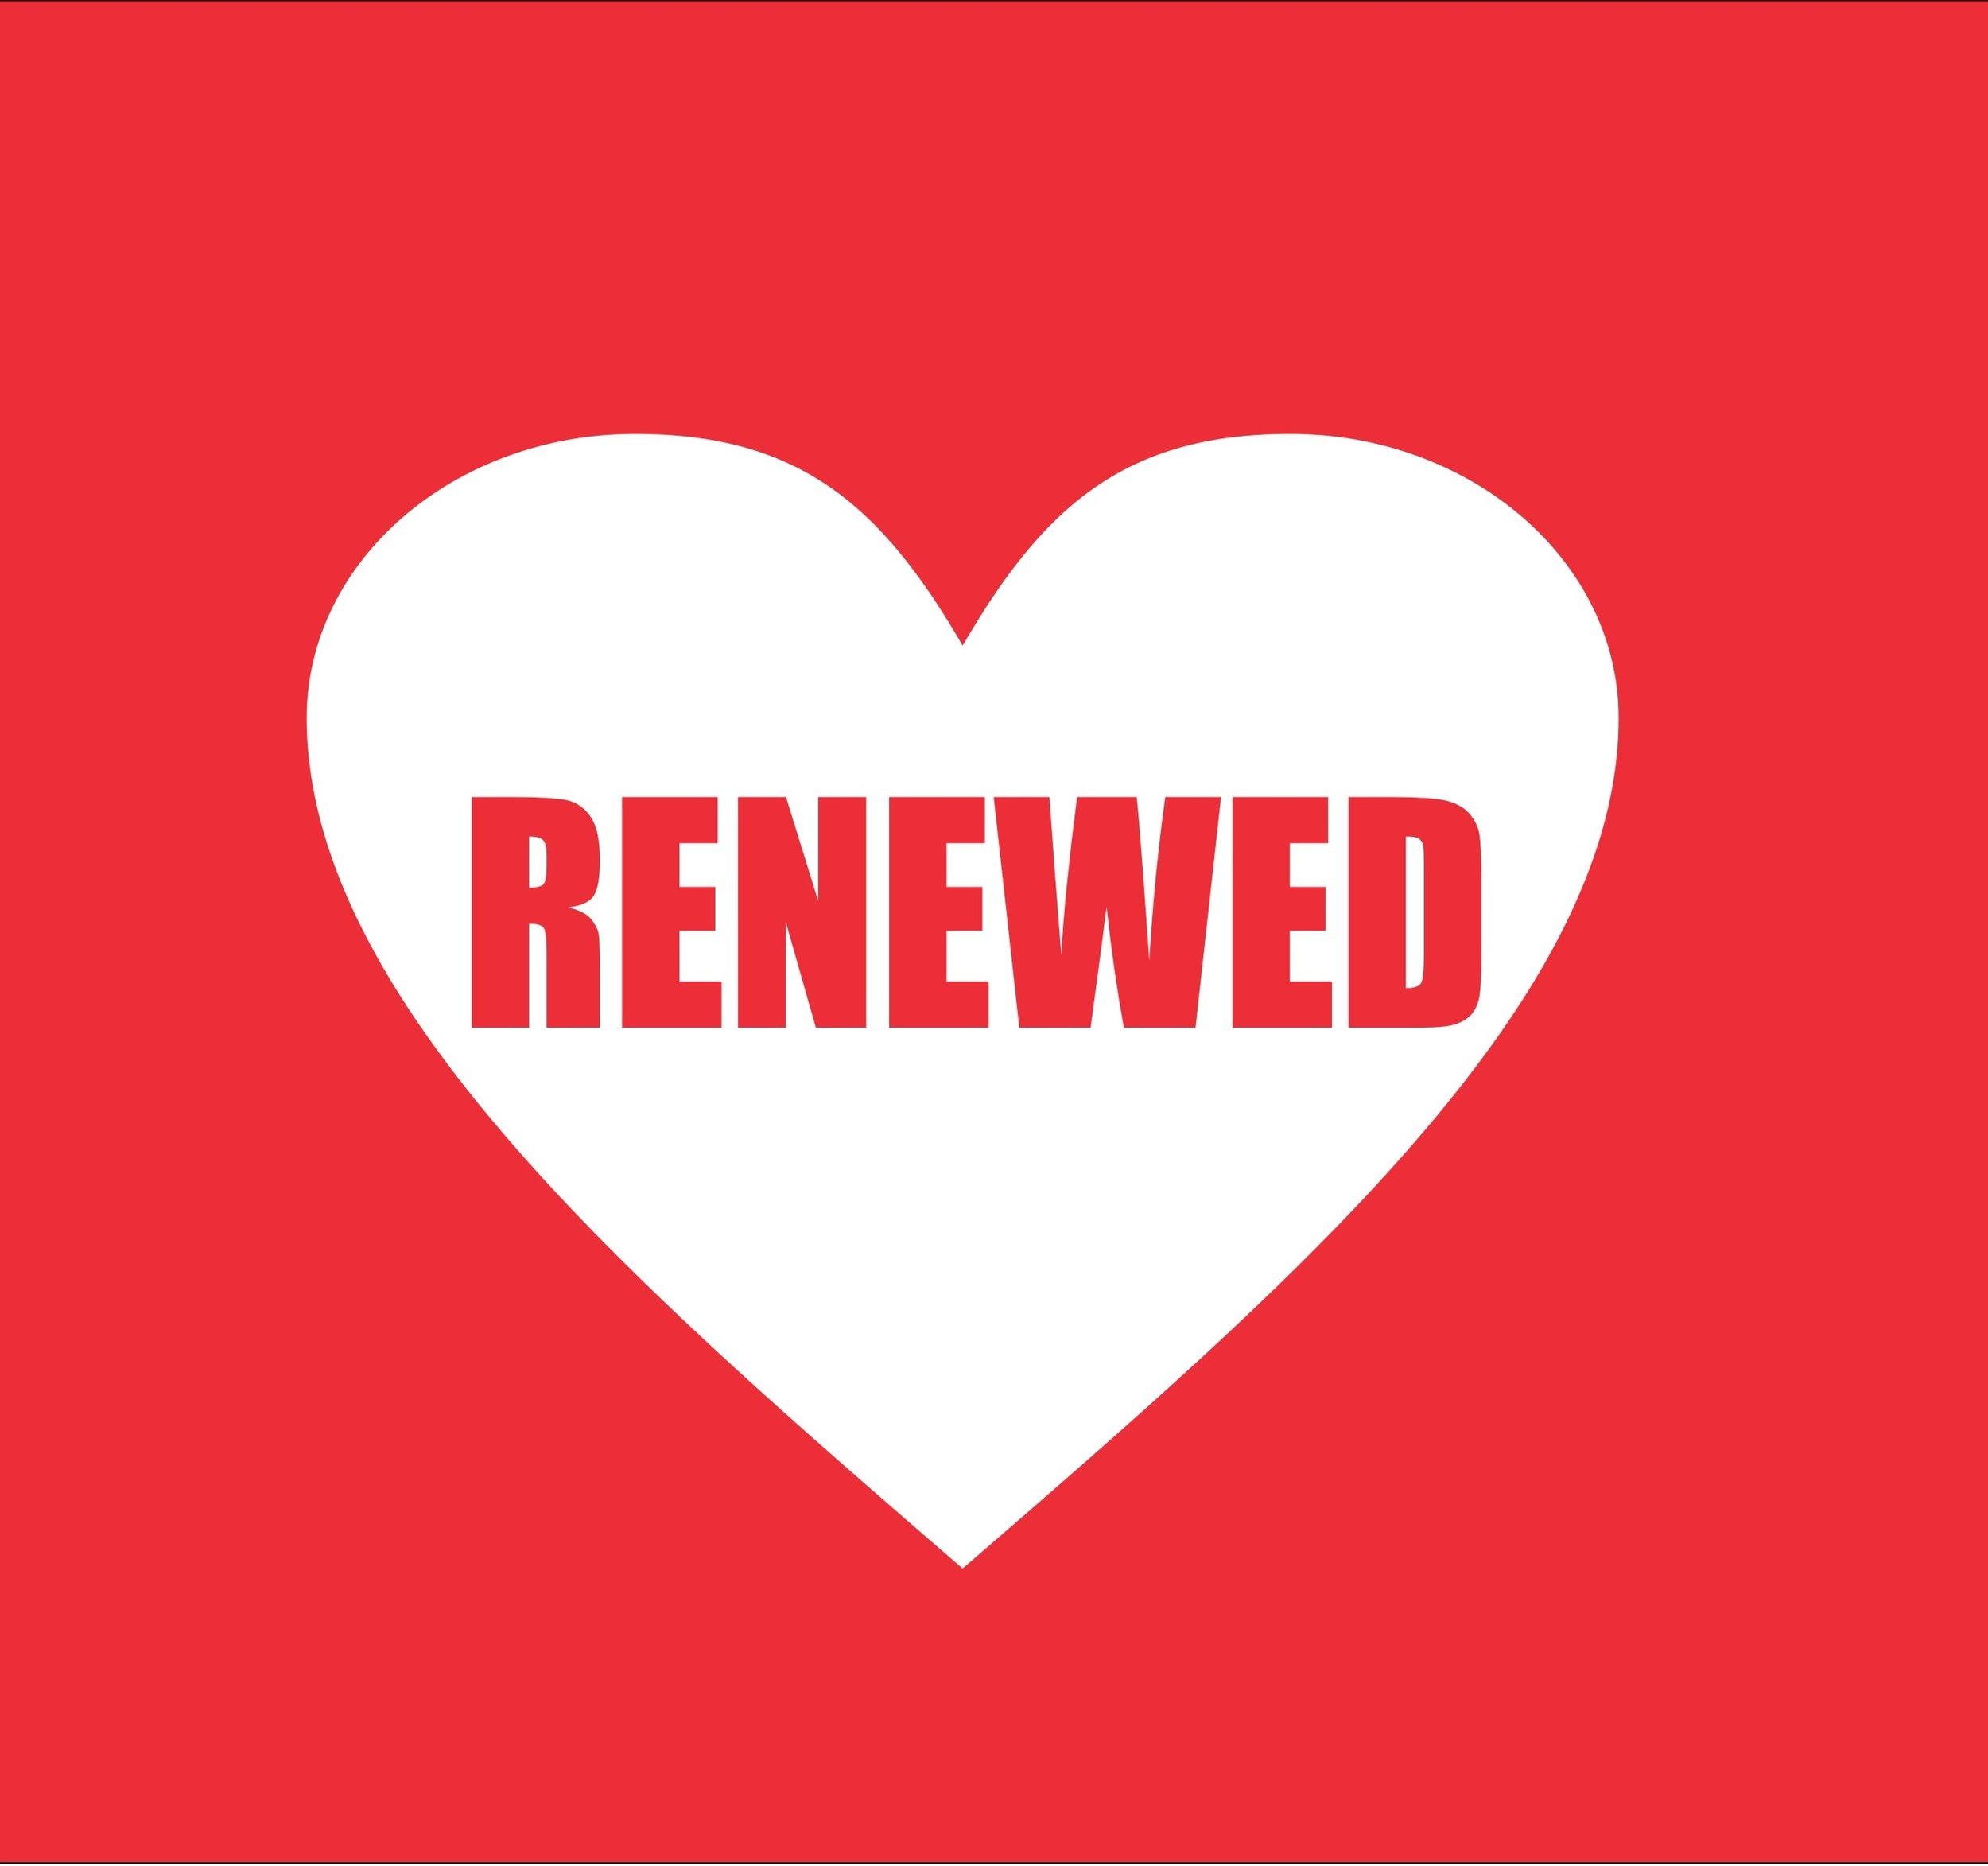 renewed1.jpg